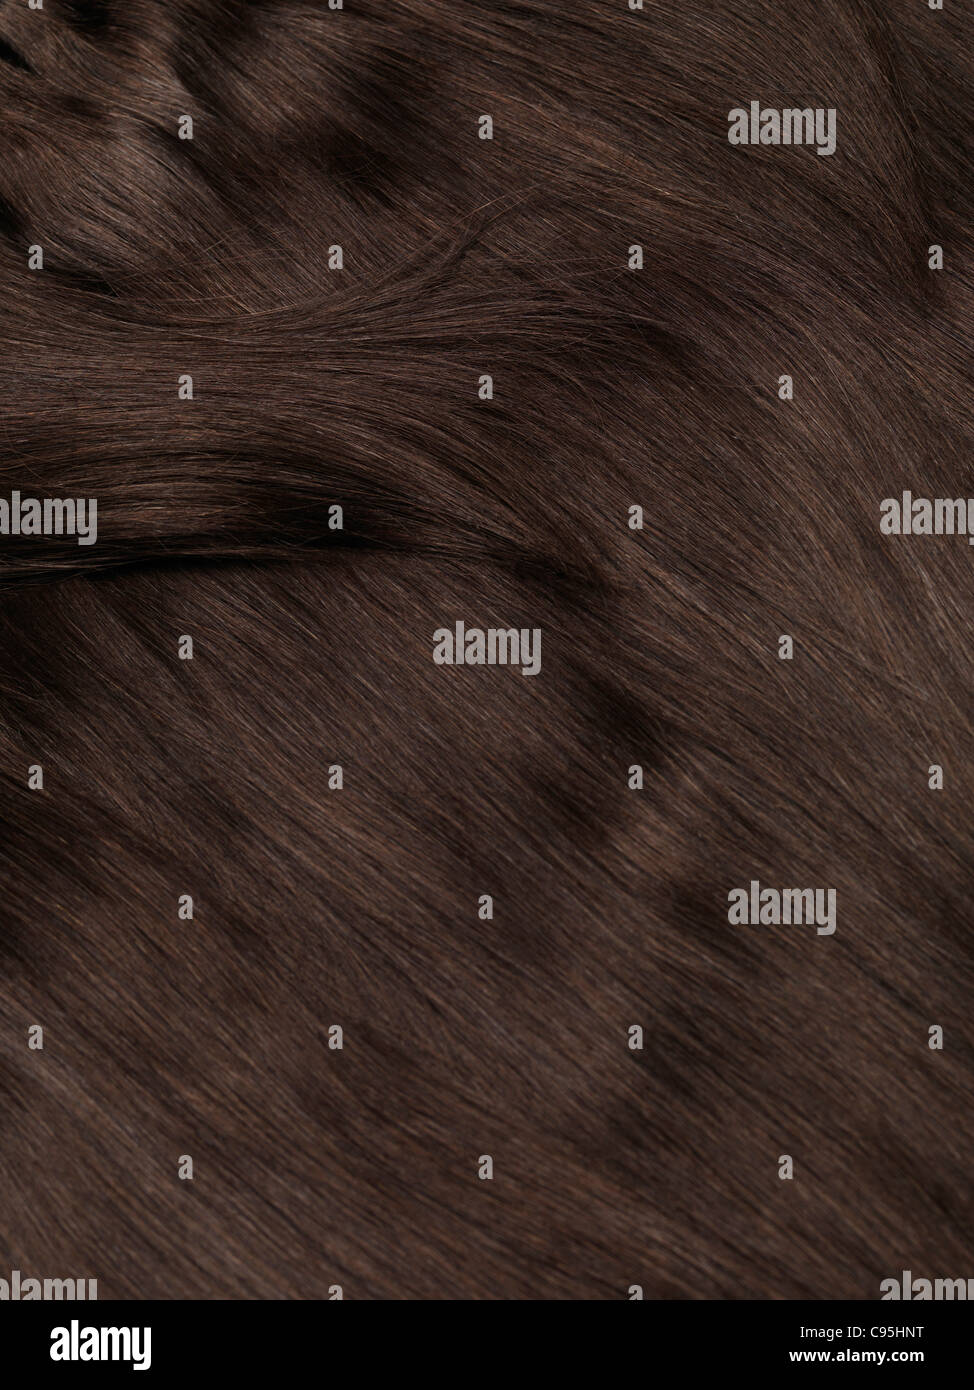 Extensiones de cabello natural humano marrón textura de fondo Imagen De Stock